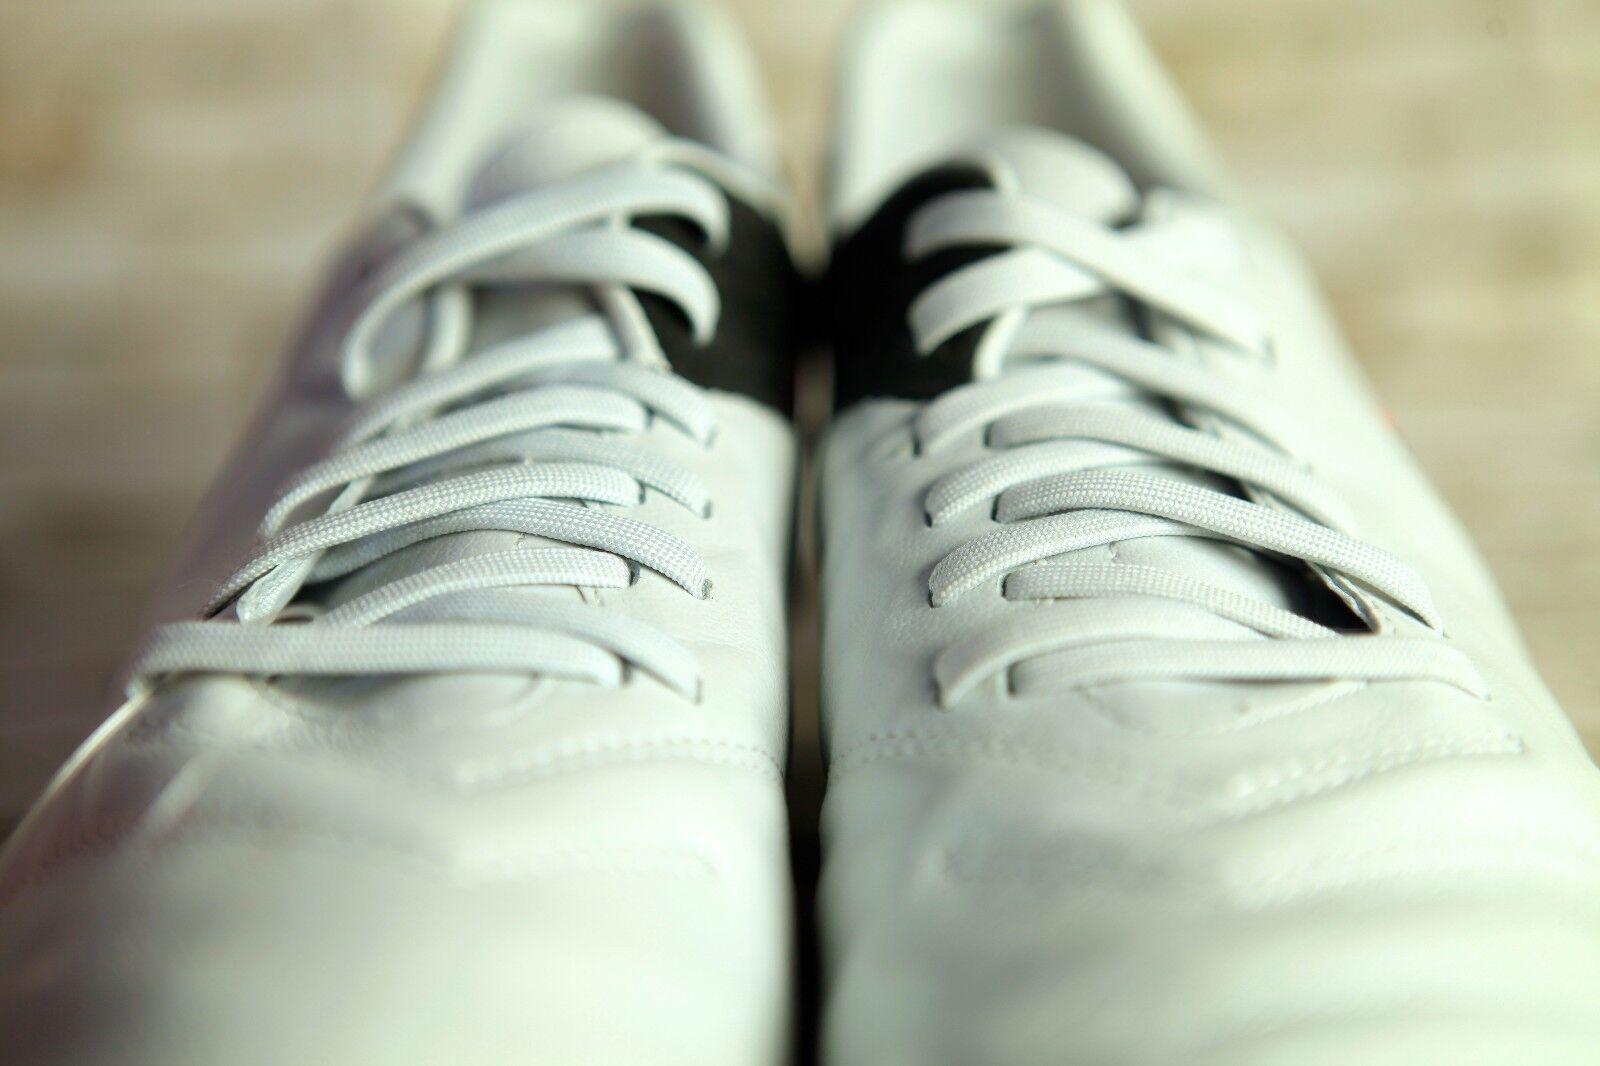 Nike - mens größe 11 tiempo mystic / fg schwarz - Nike orange leder stollenschuhe legende ad91bc